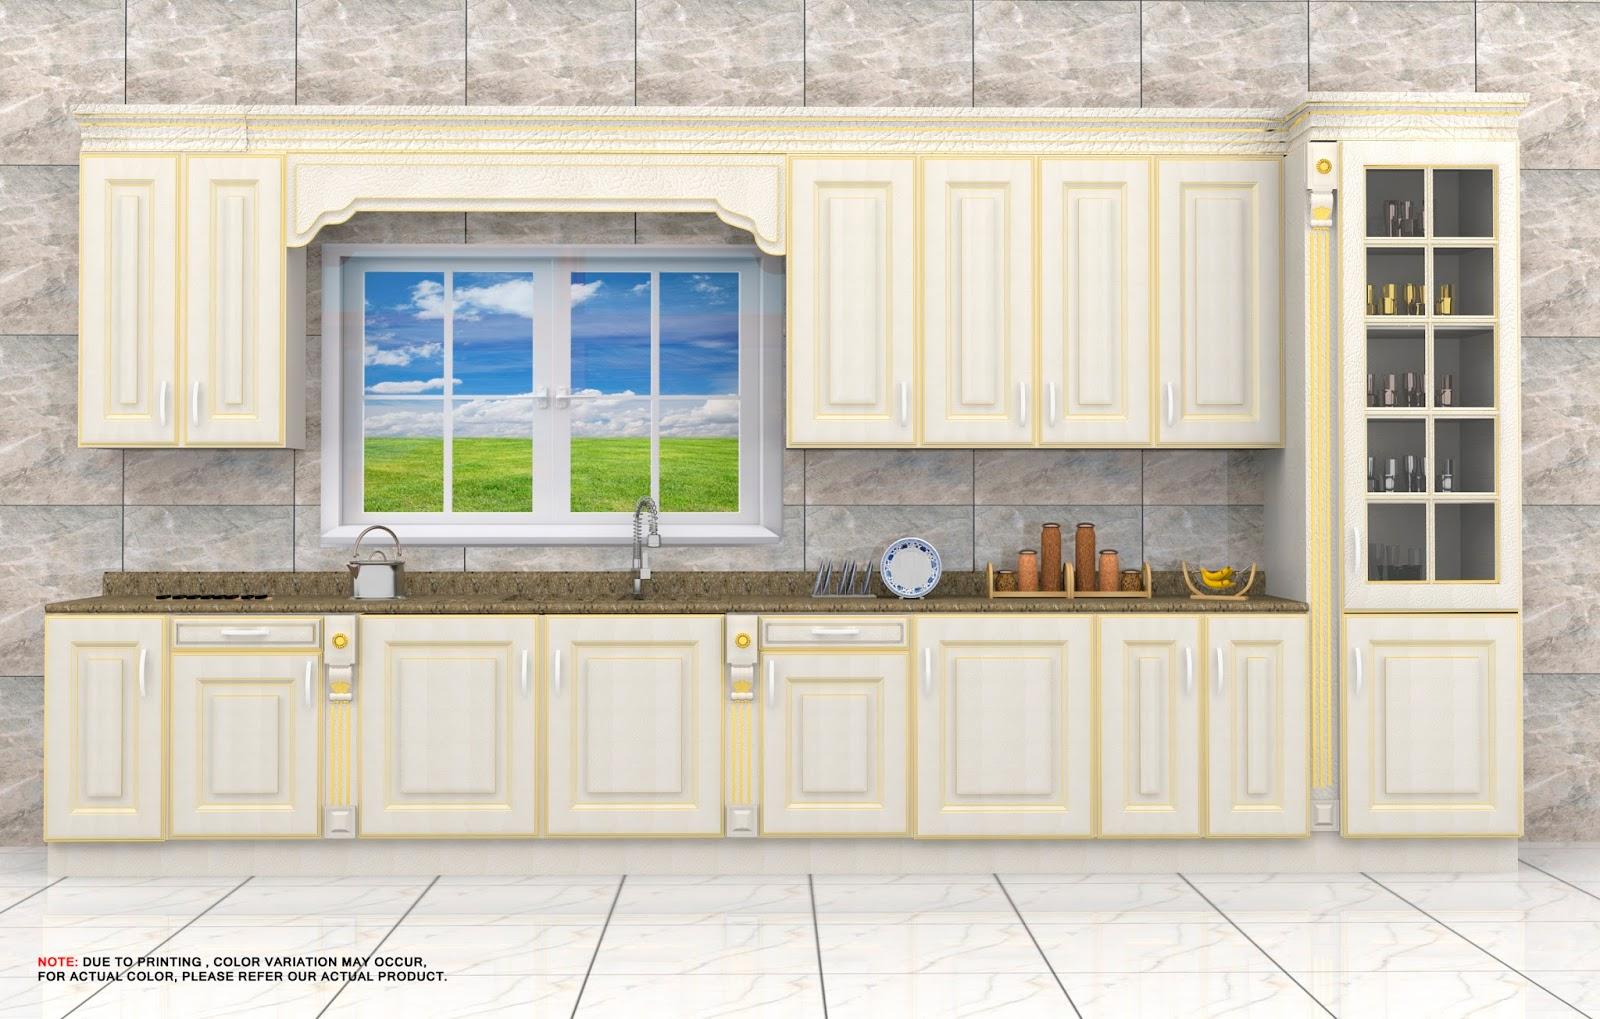 Kd Max Kitchen Design Software Image By Reitabswlaf